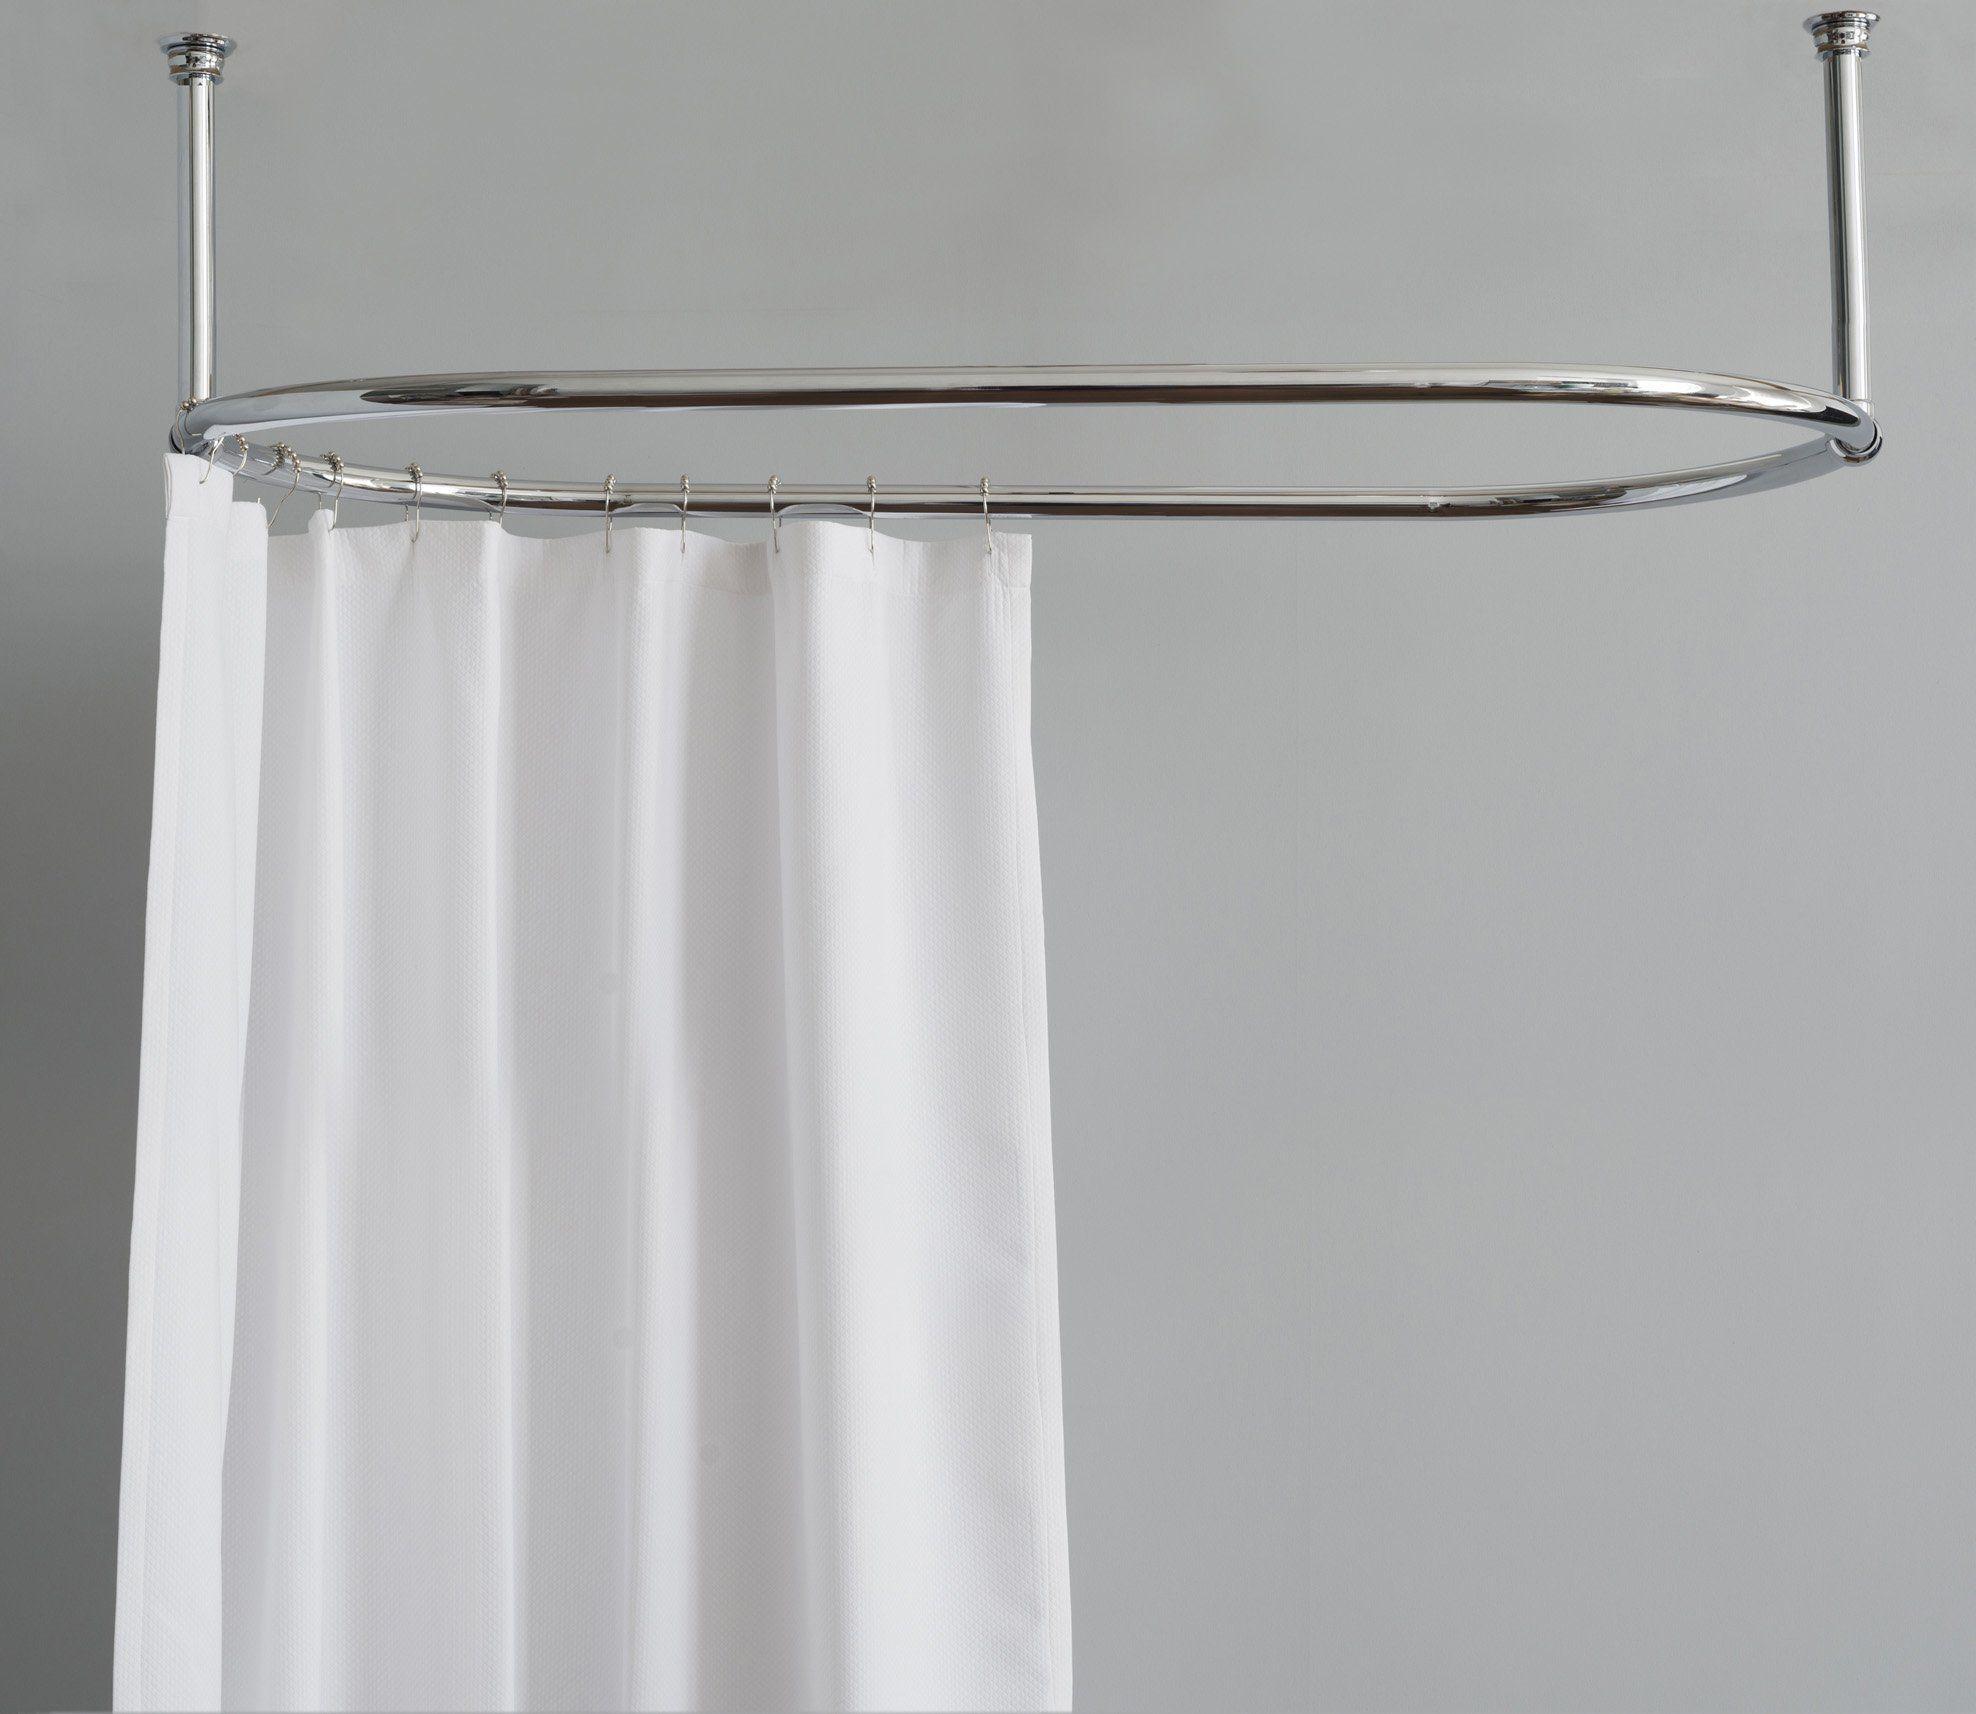 Shower Curtain Rail Oval Shower Curtain Curtain Rails Coral